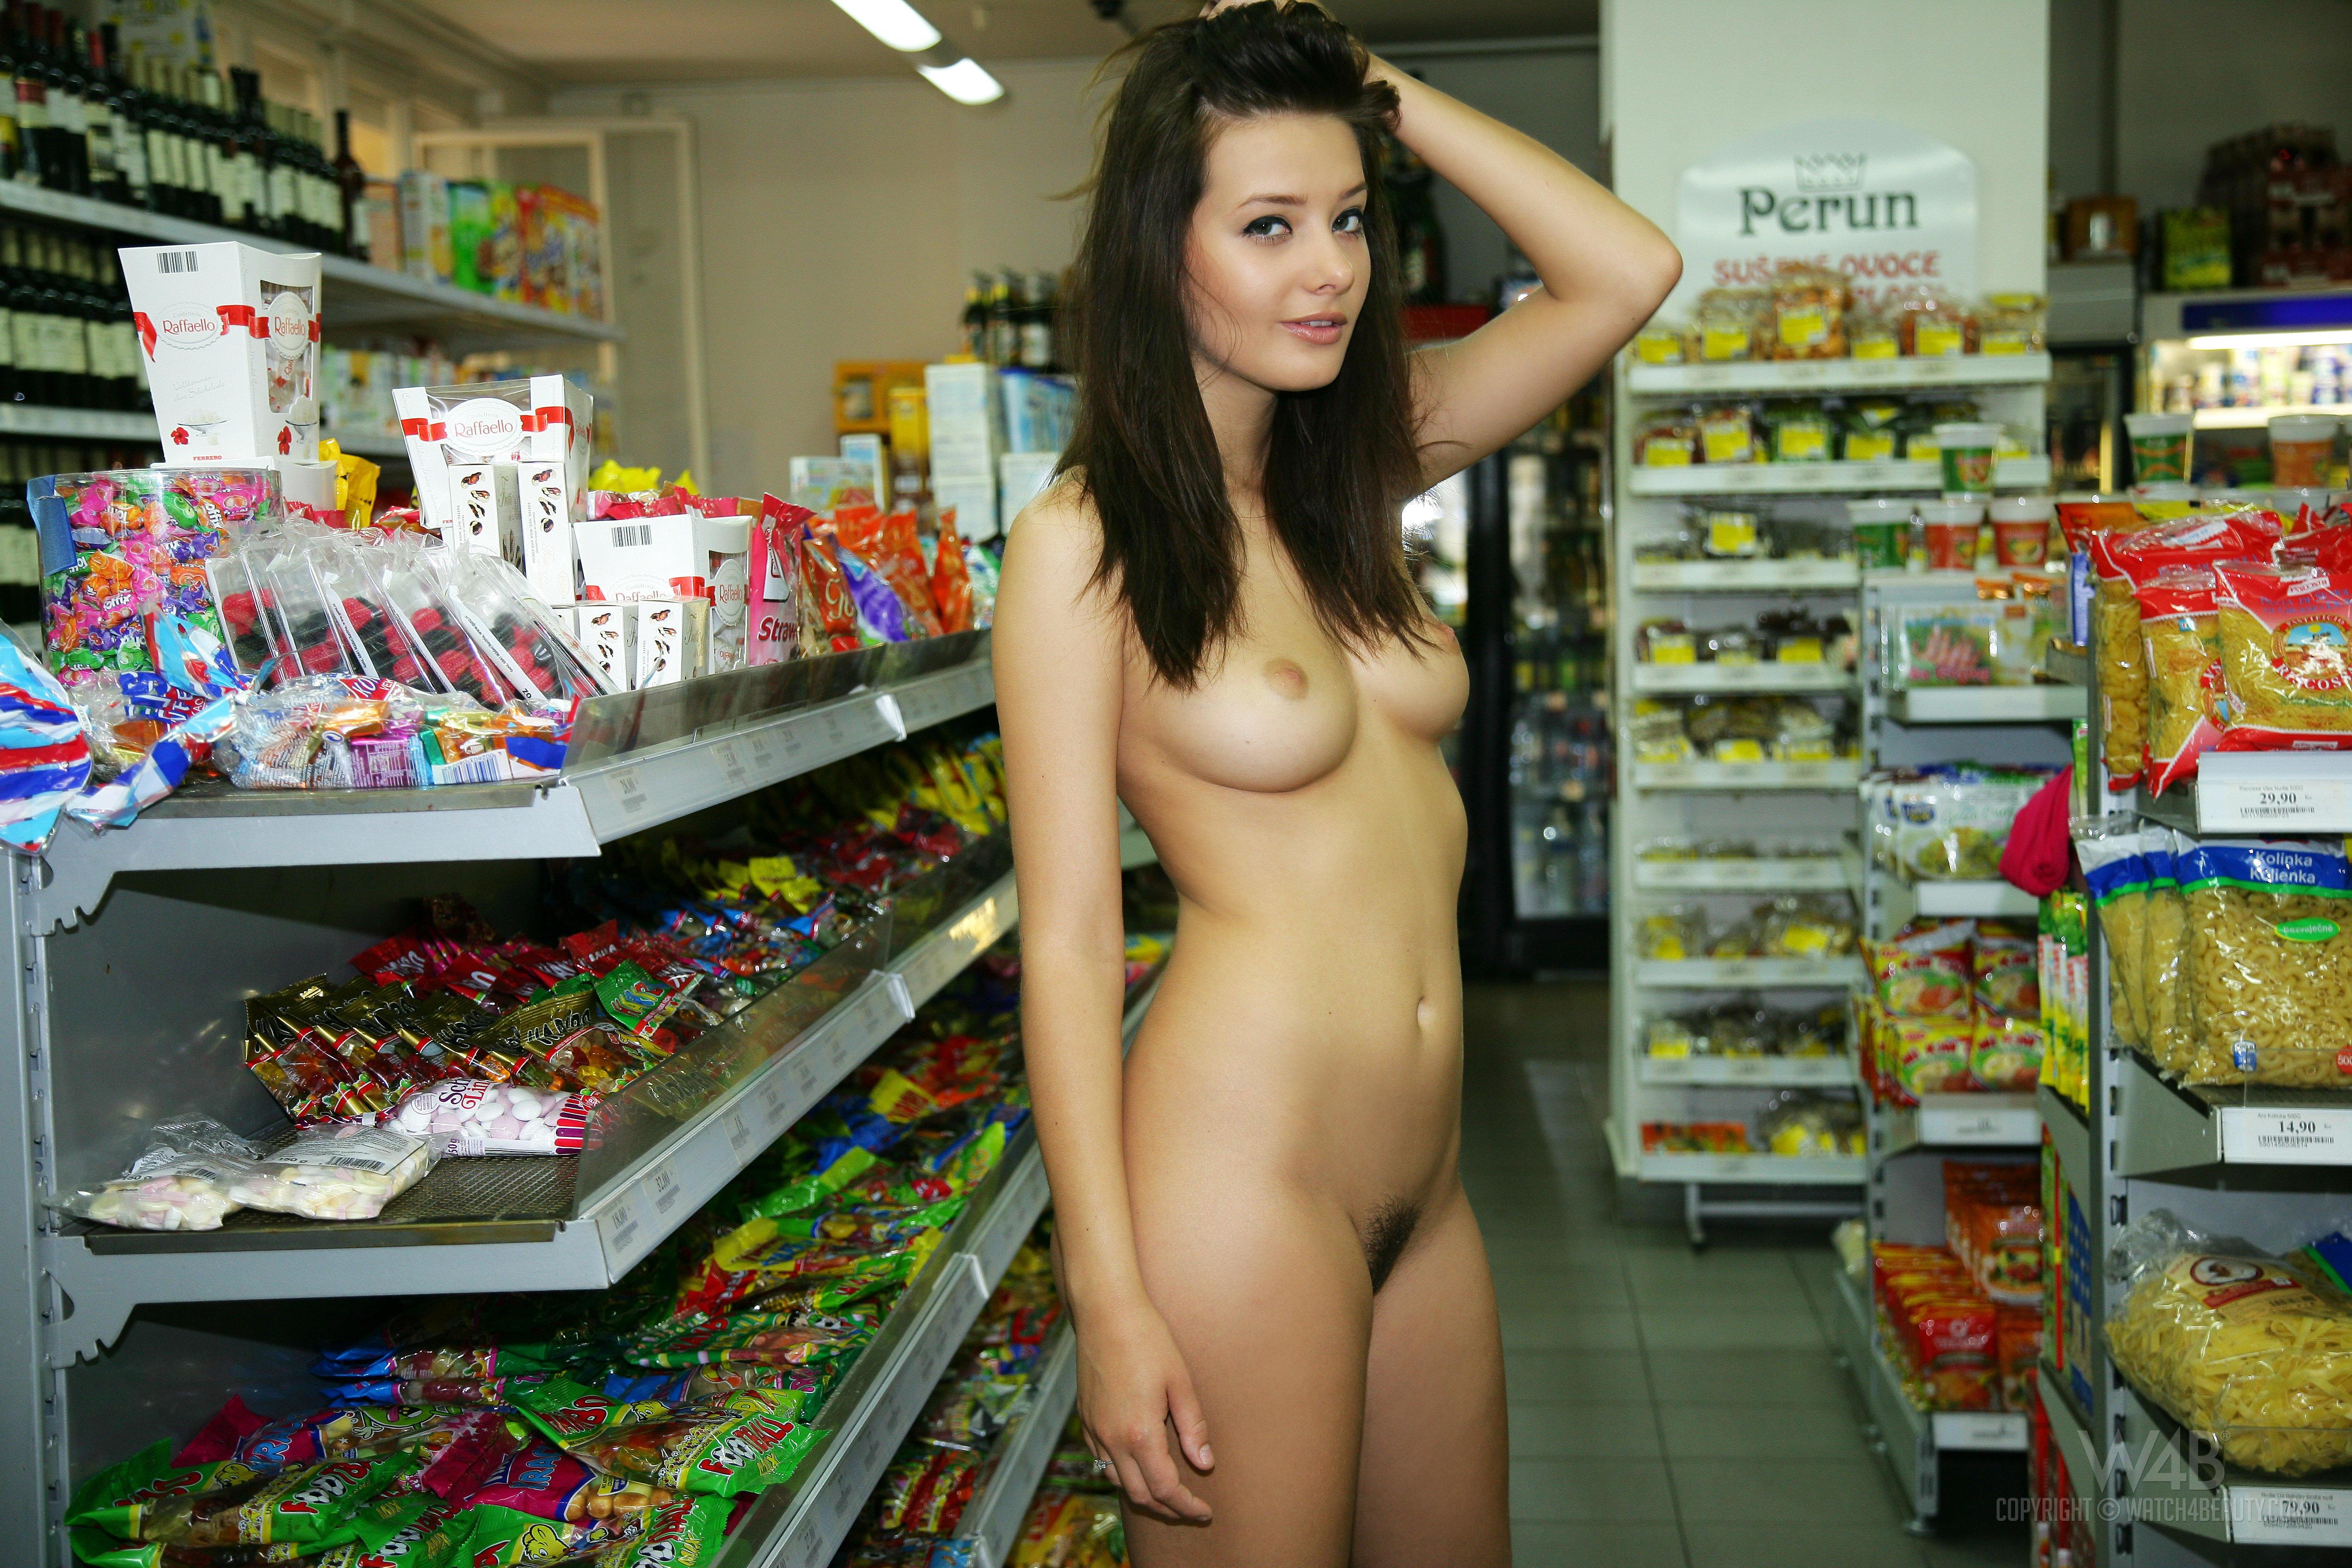 Lesbians pictures nude women of walmart